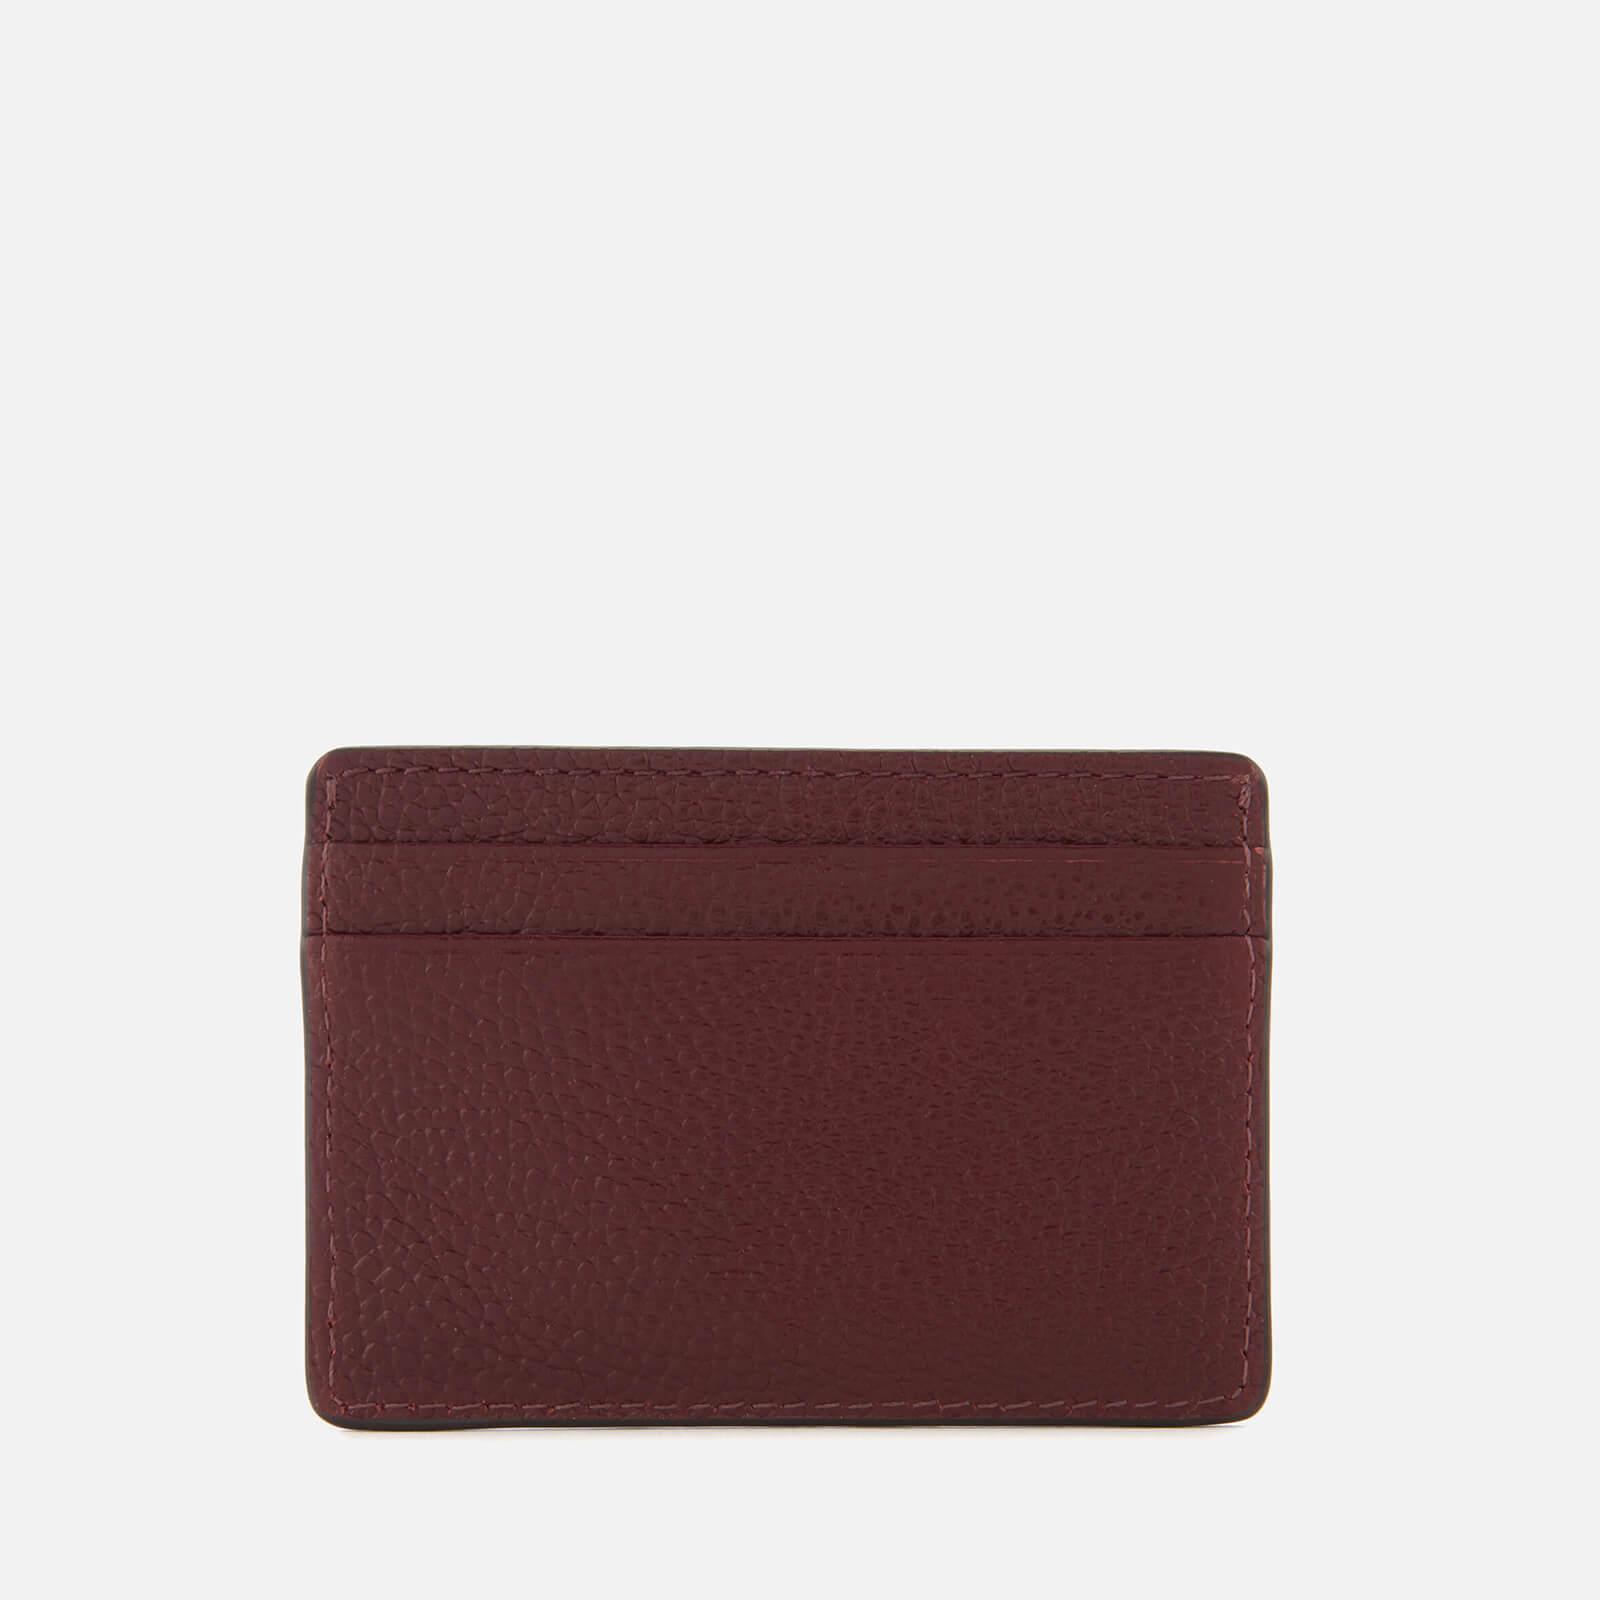 68e273e0e72b Michael Michael Kors Money Pieces Card Holder in Purple - Lyst